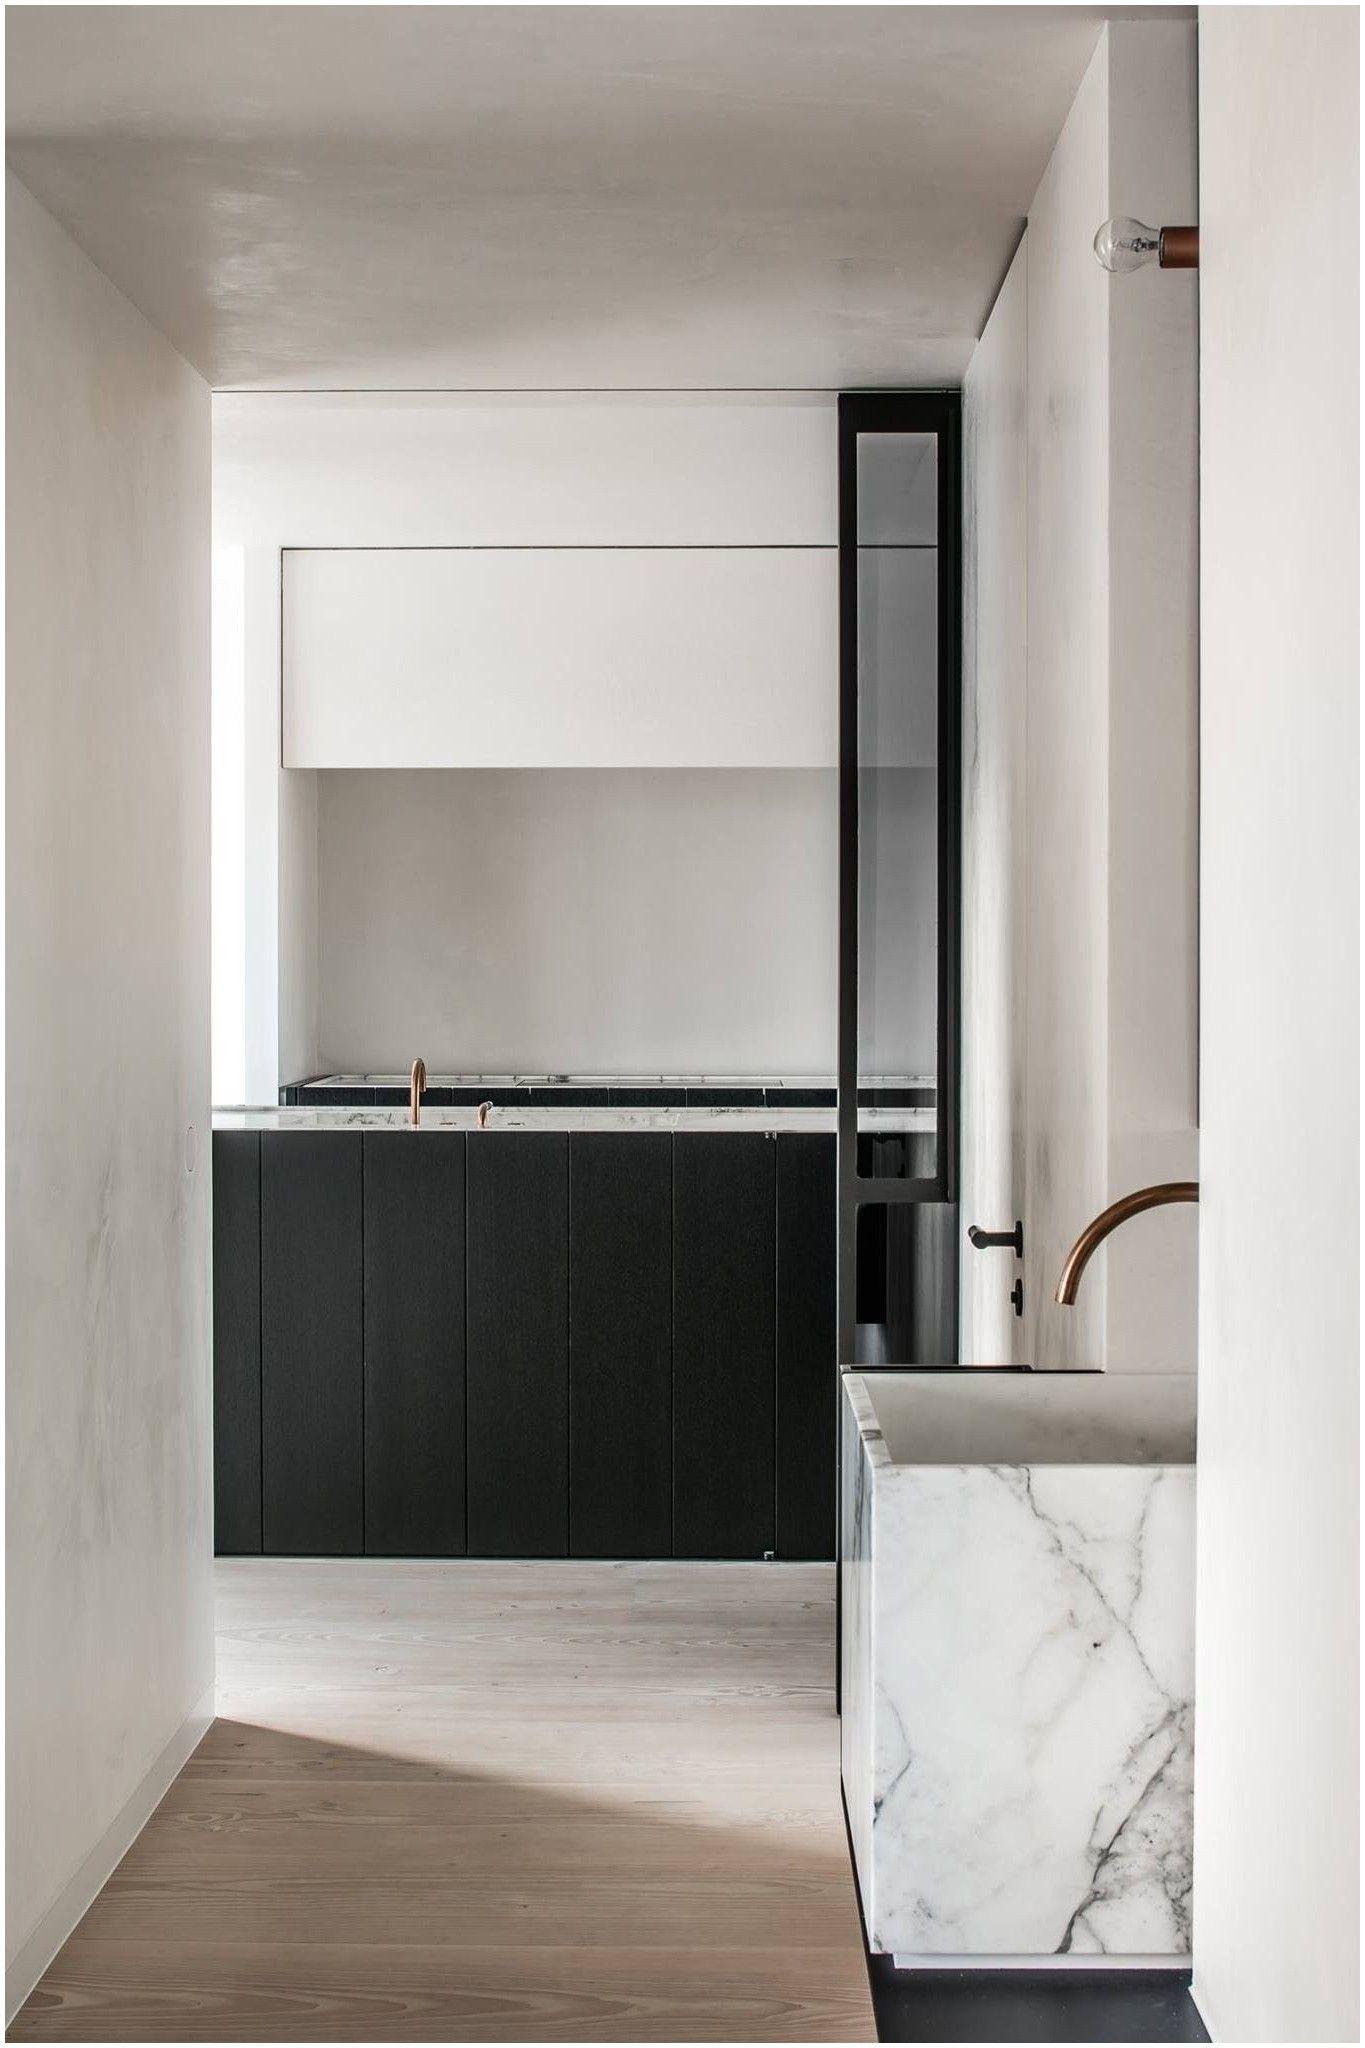 New Carrelage Cuisine Professionnelle Minimalist Bathroom Design Bathroom Furniture Modern Diy Bathroom Decor